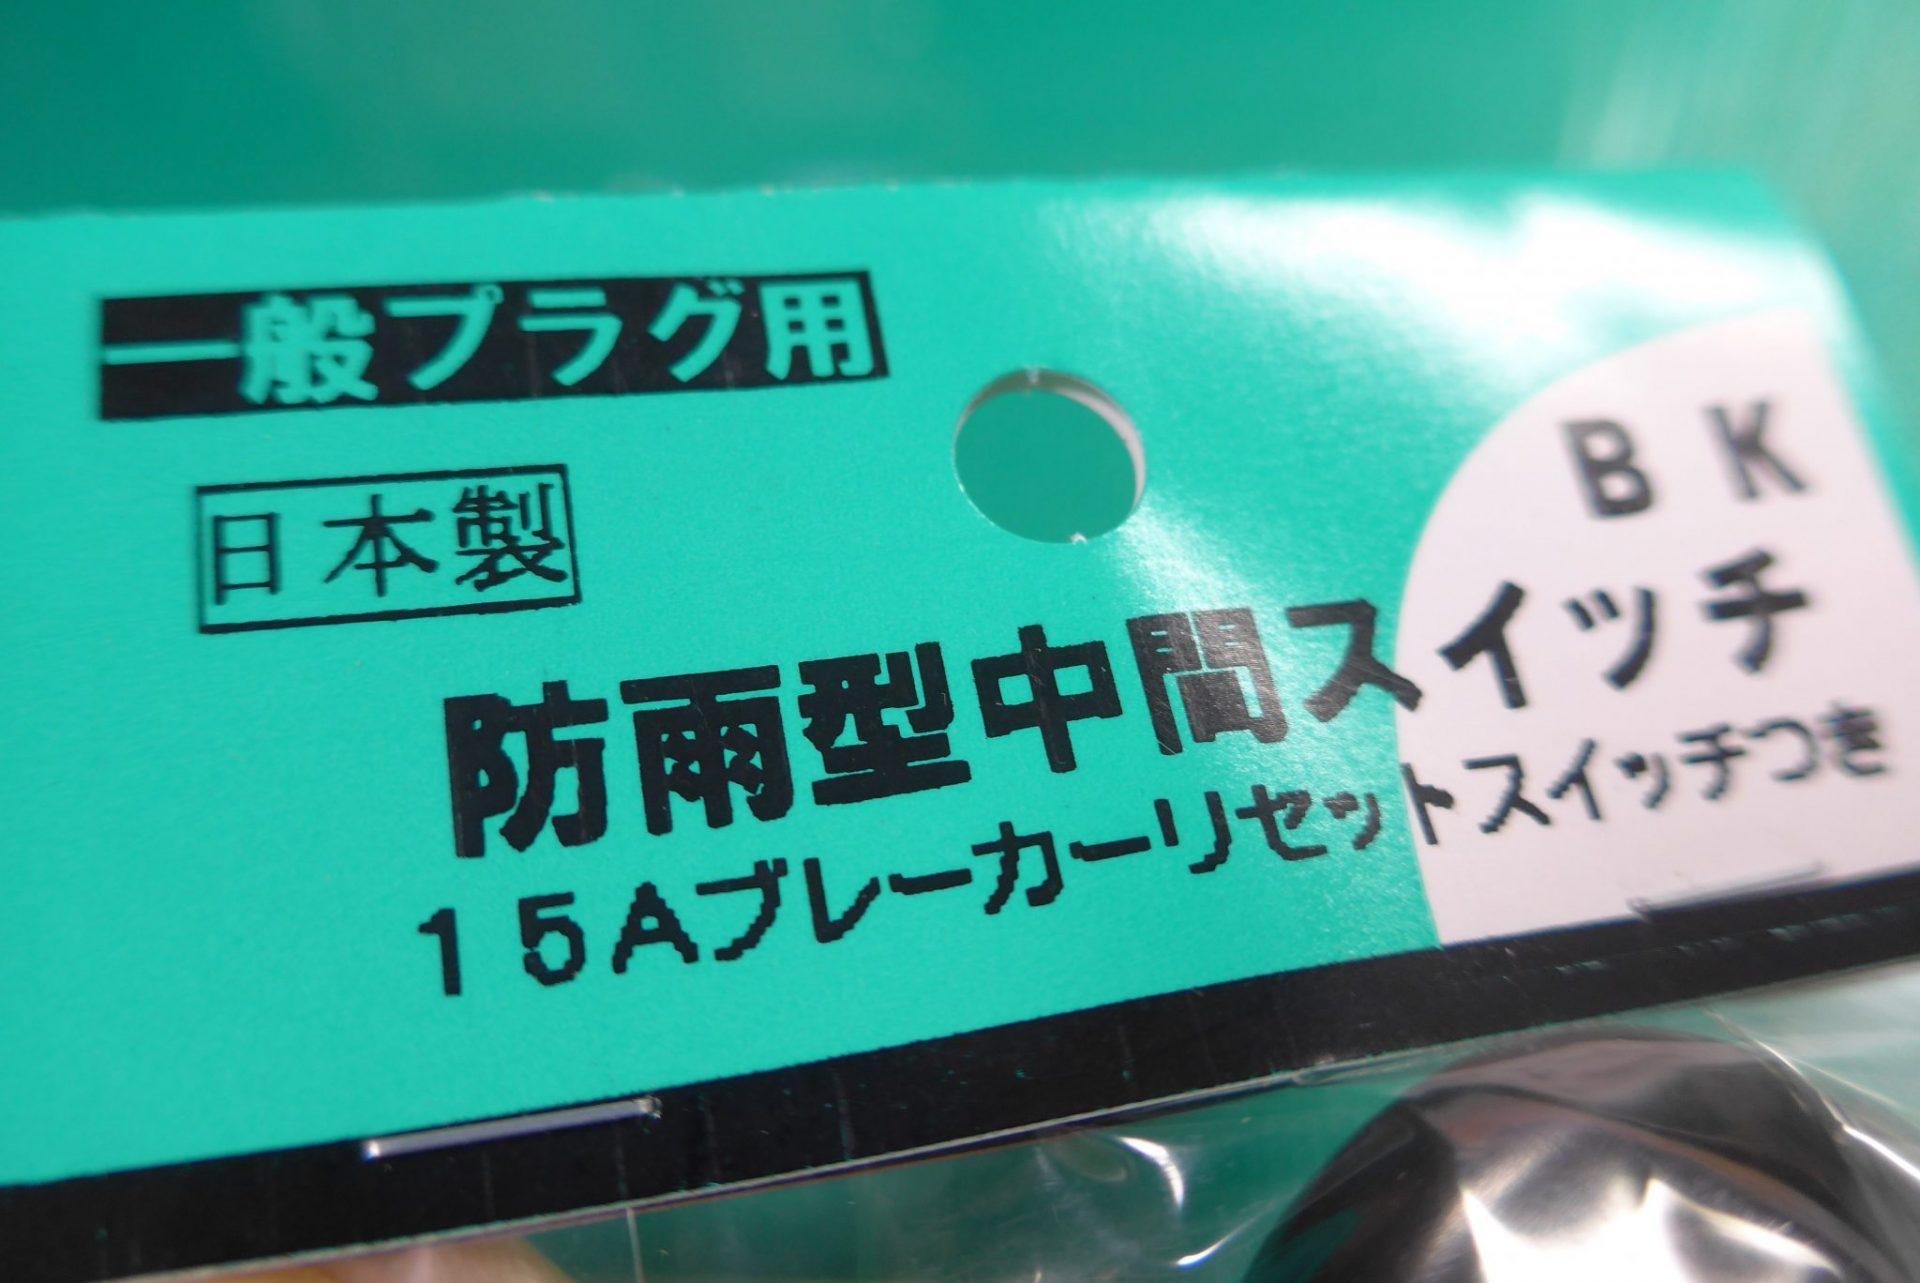 (K)防雨型中間スイッチ!イーエフデルタと外部電源を安全に操作!